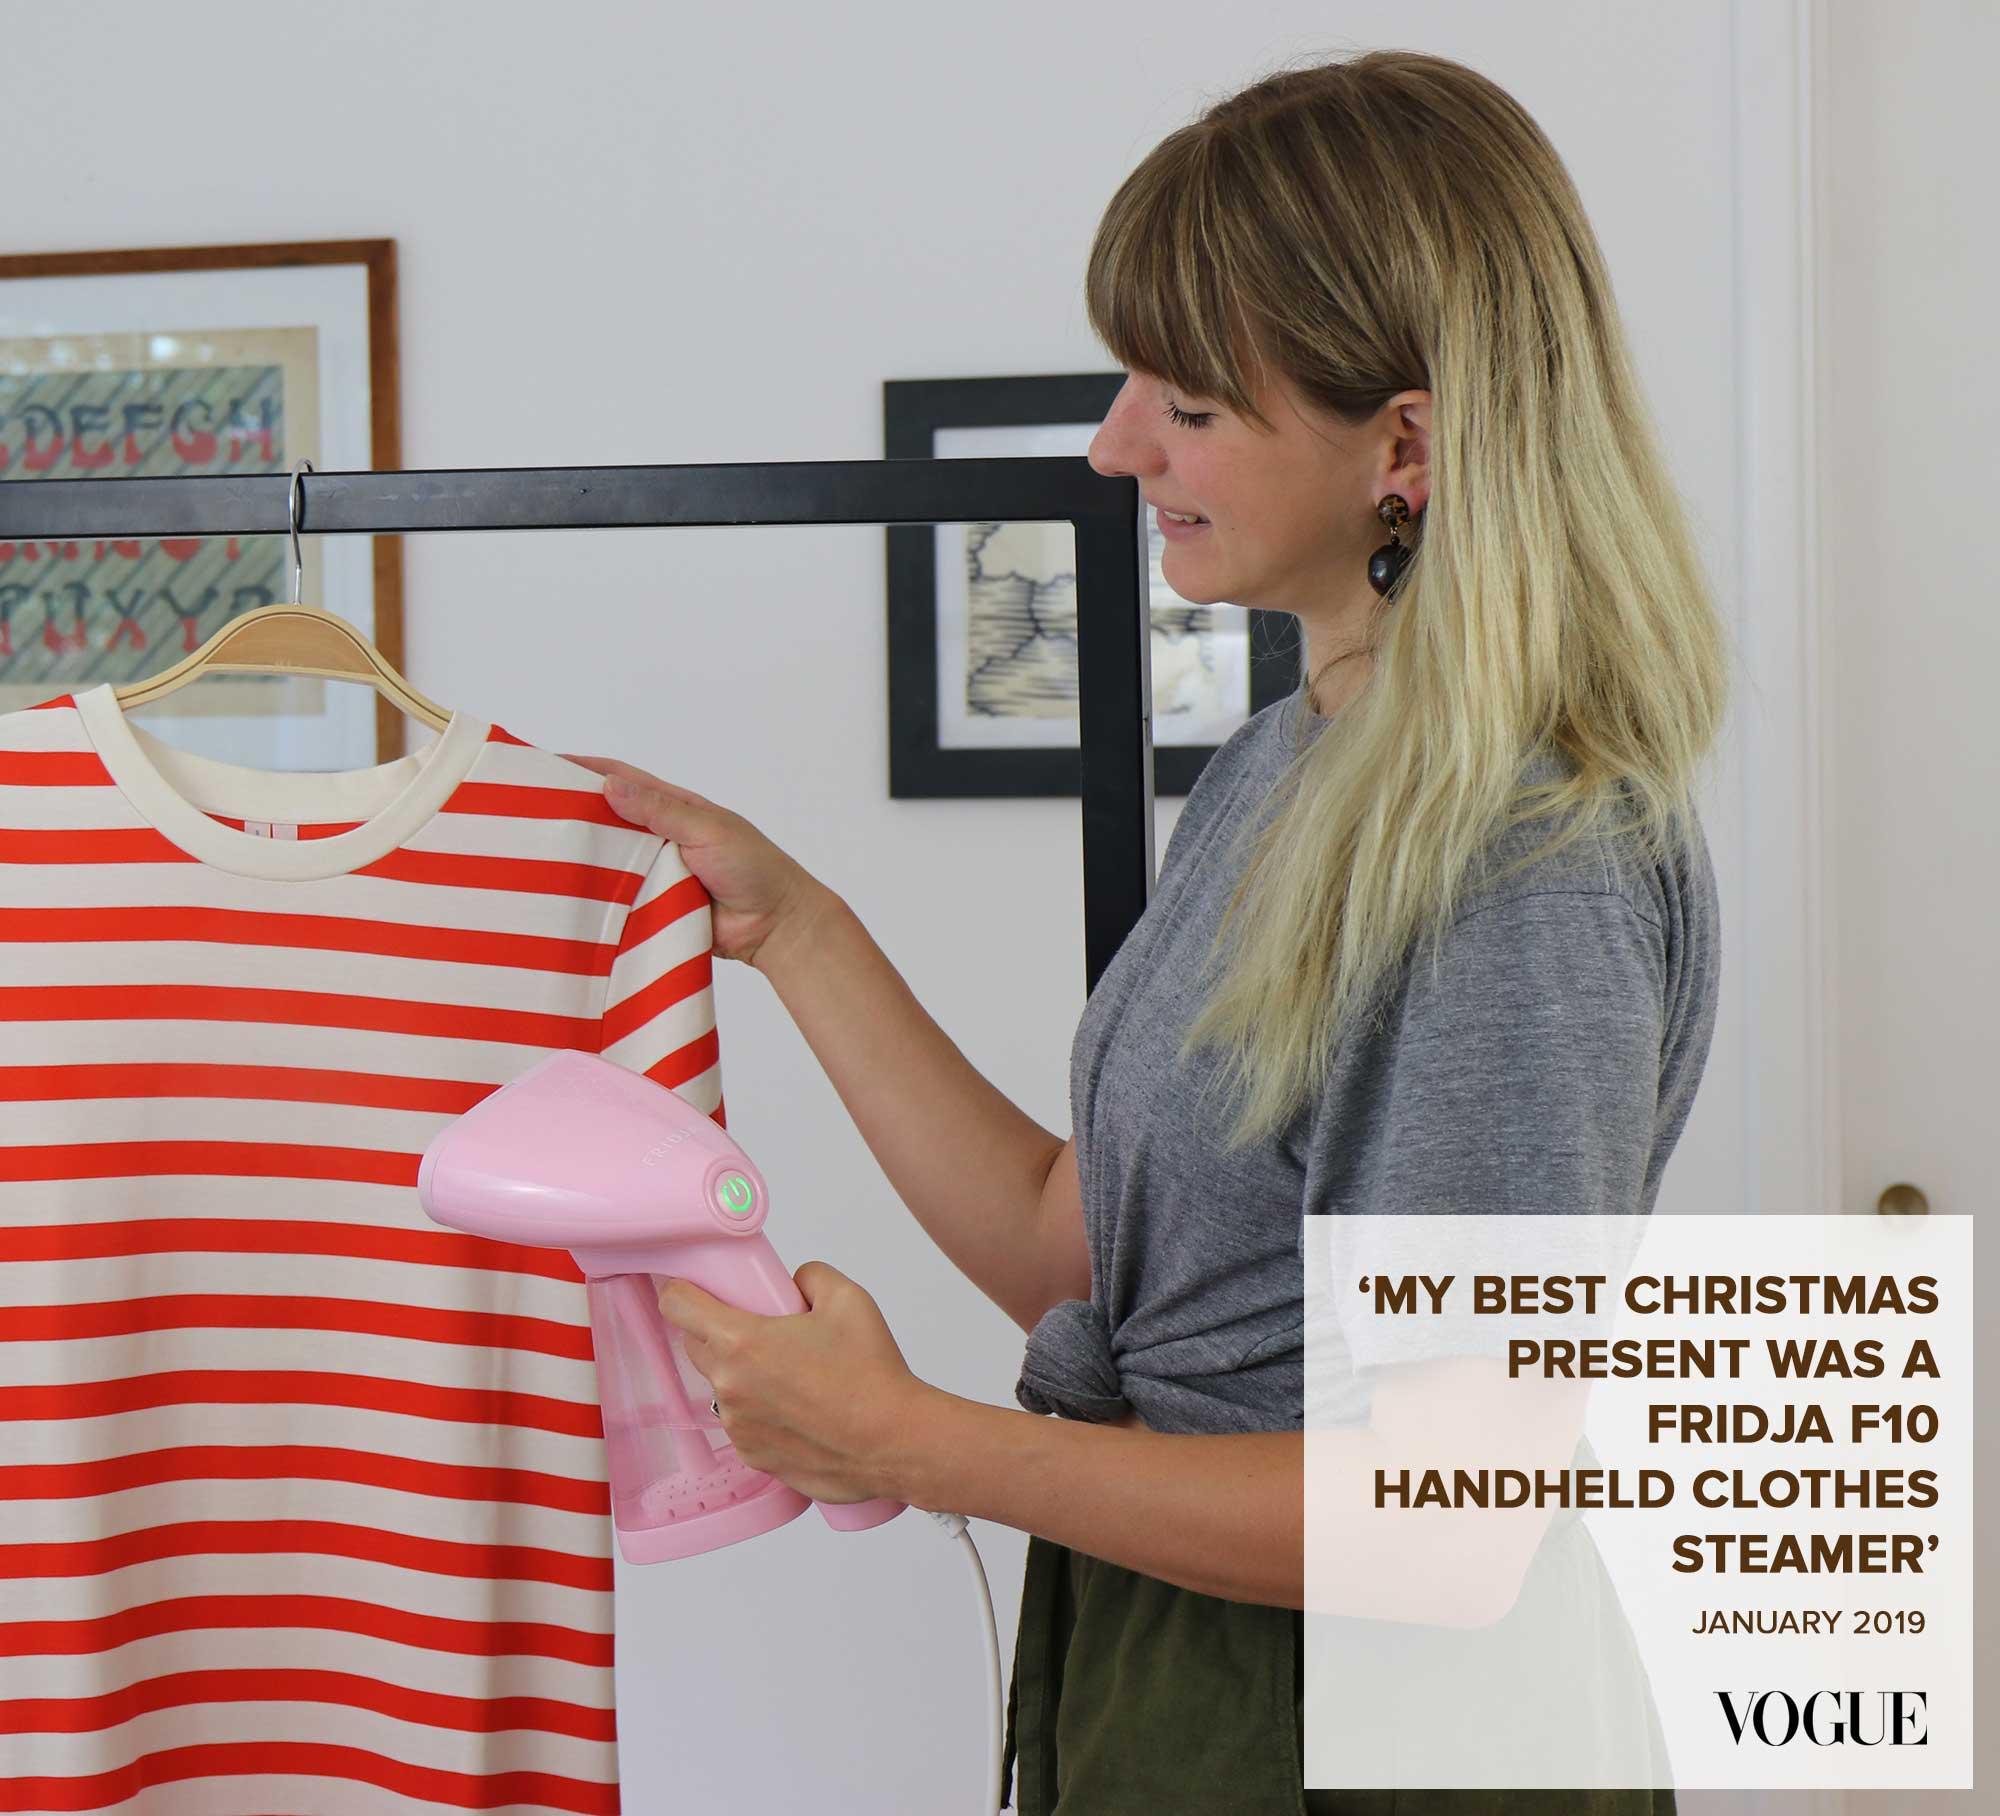 Fridja f10 handheld clothes steamer vogue